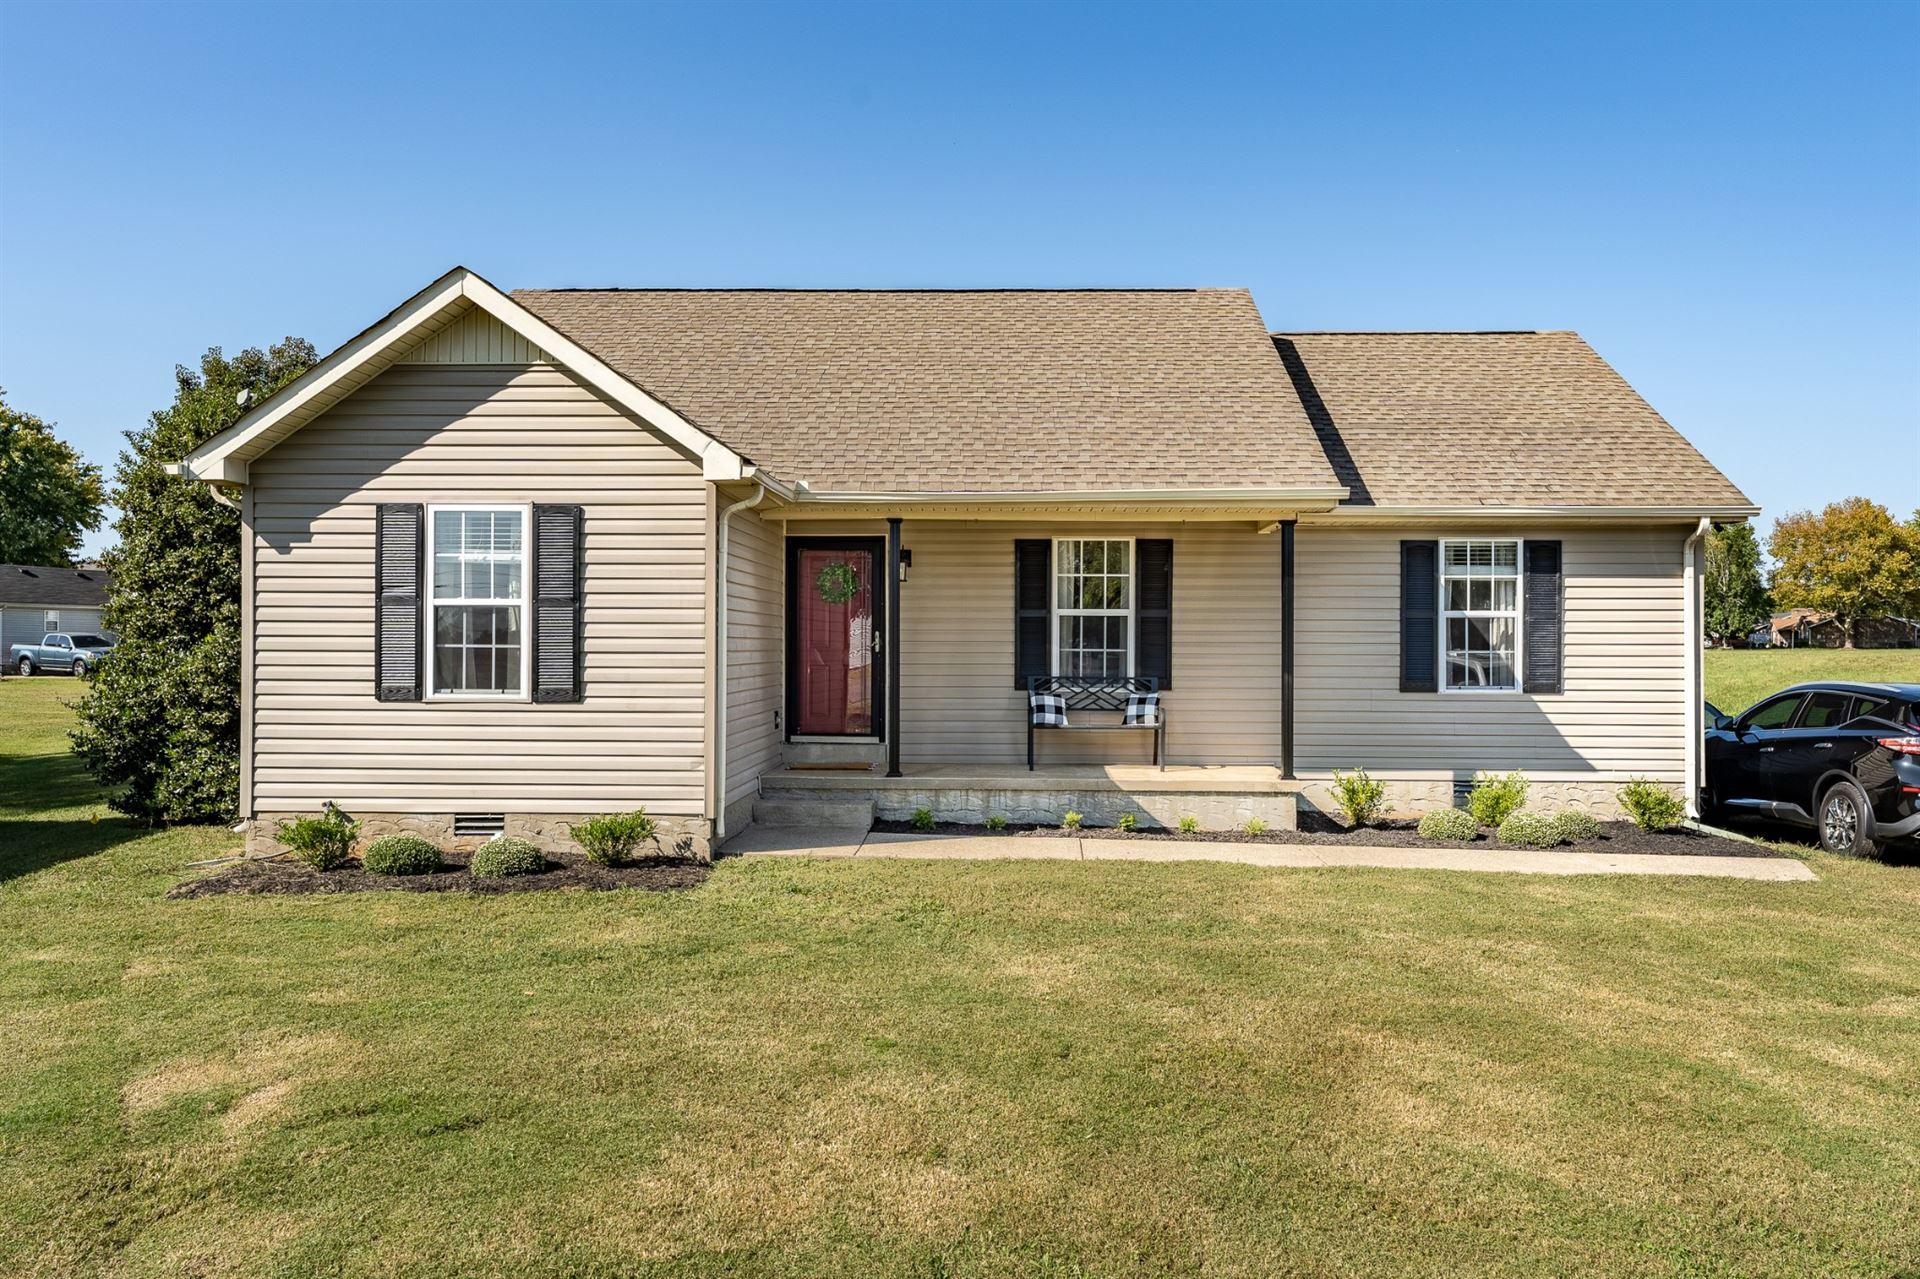 2406 Glad Court, Murfreesboro, TN 37128 - MLS#: 2196825